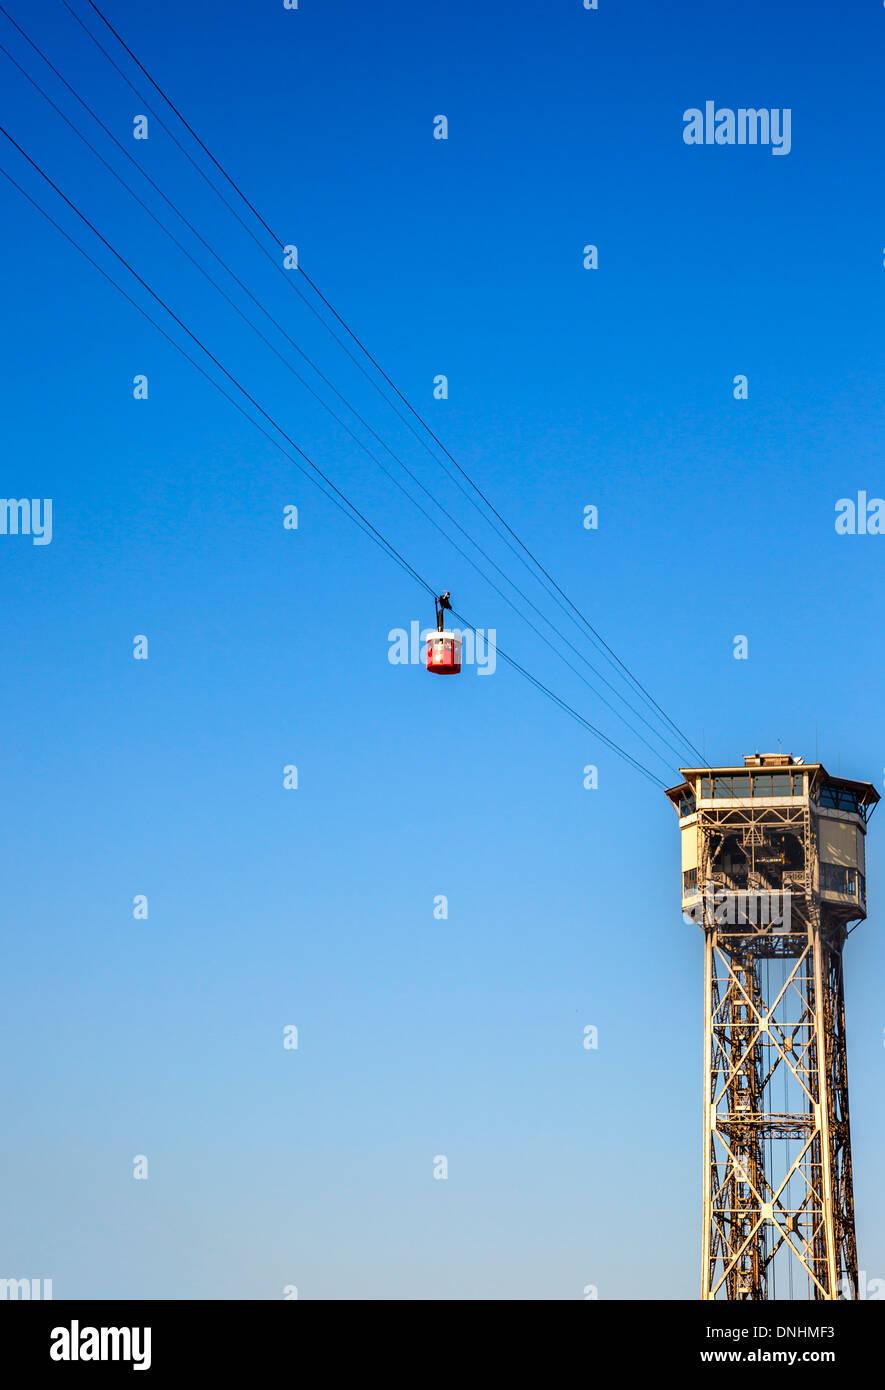 Niedrigen Winkel Ansicht der Seilbahn, Barcelona, Katalonien, Spanien Stockbild